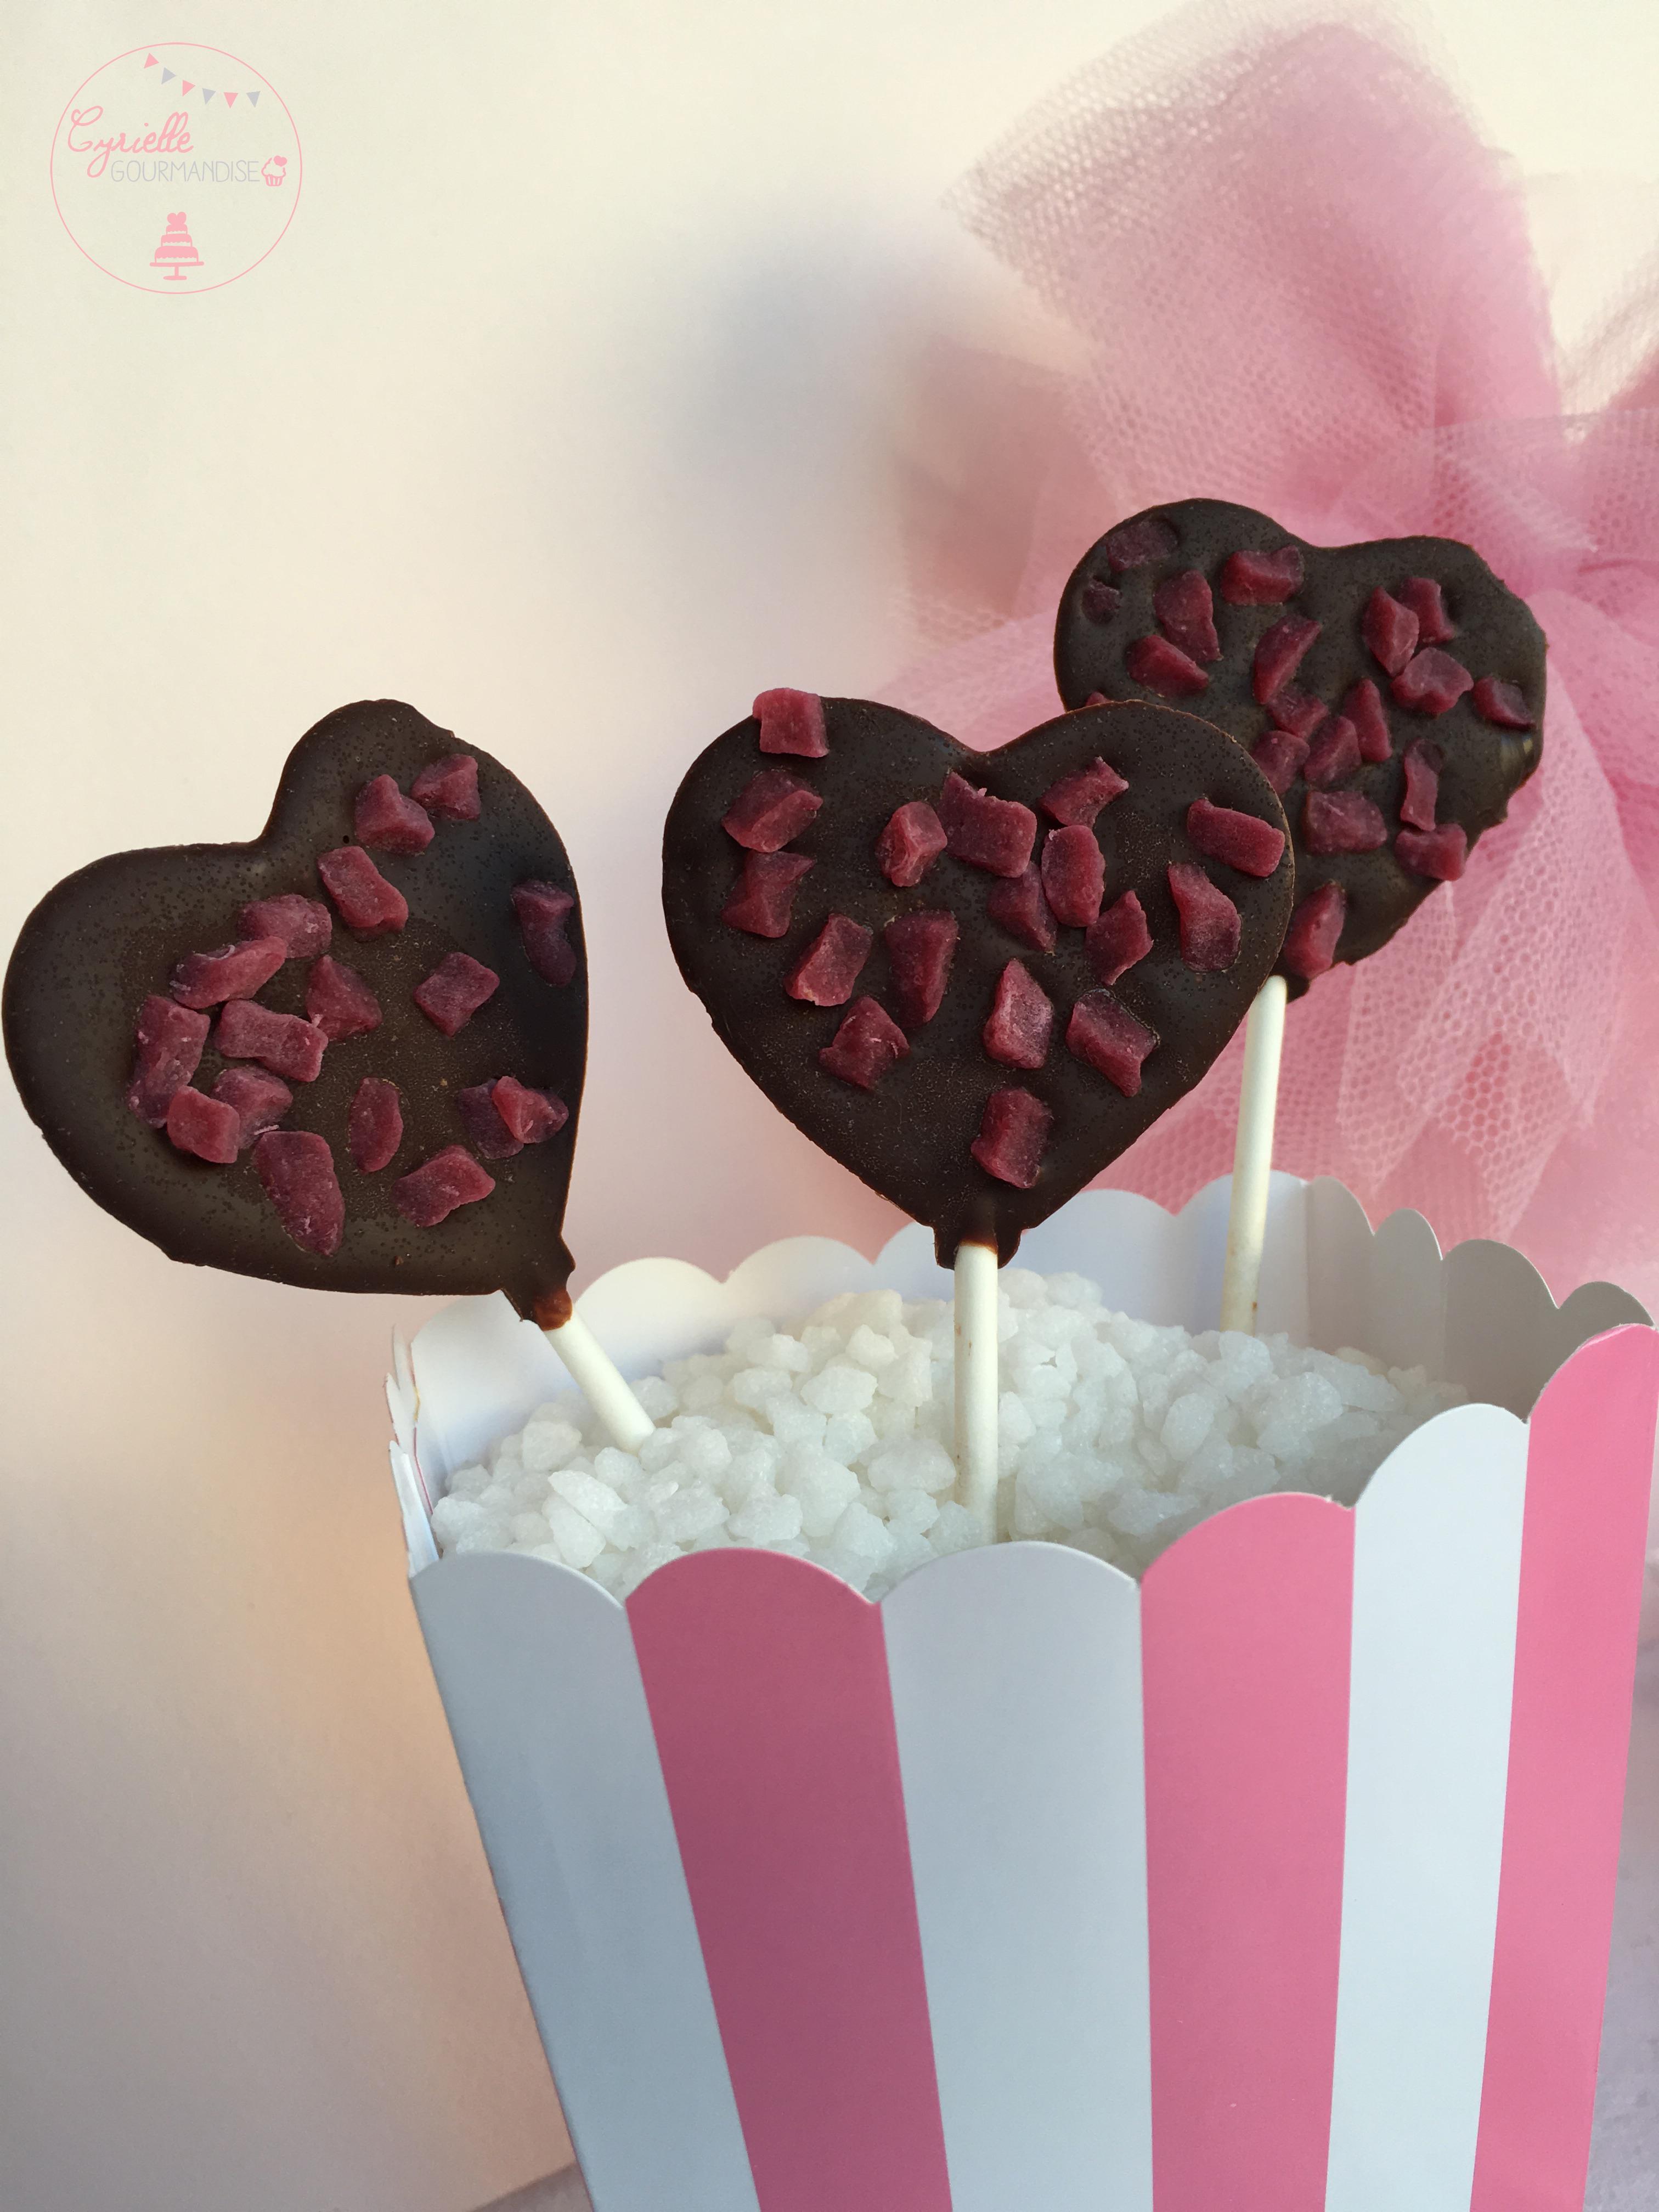 Sucettes chocolat framboise 3